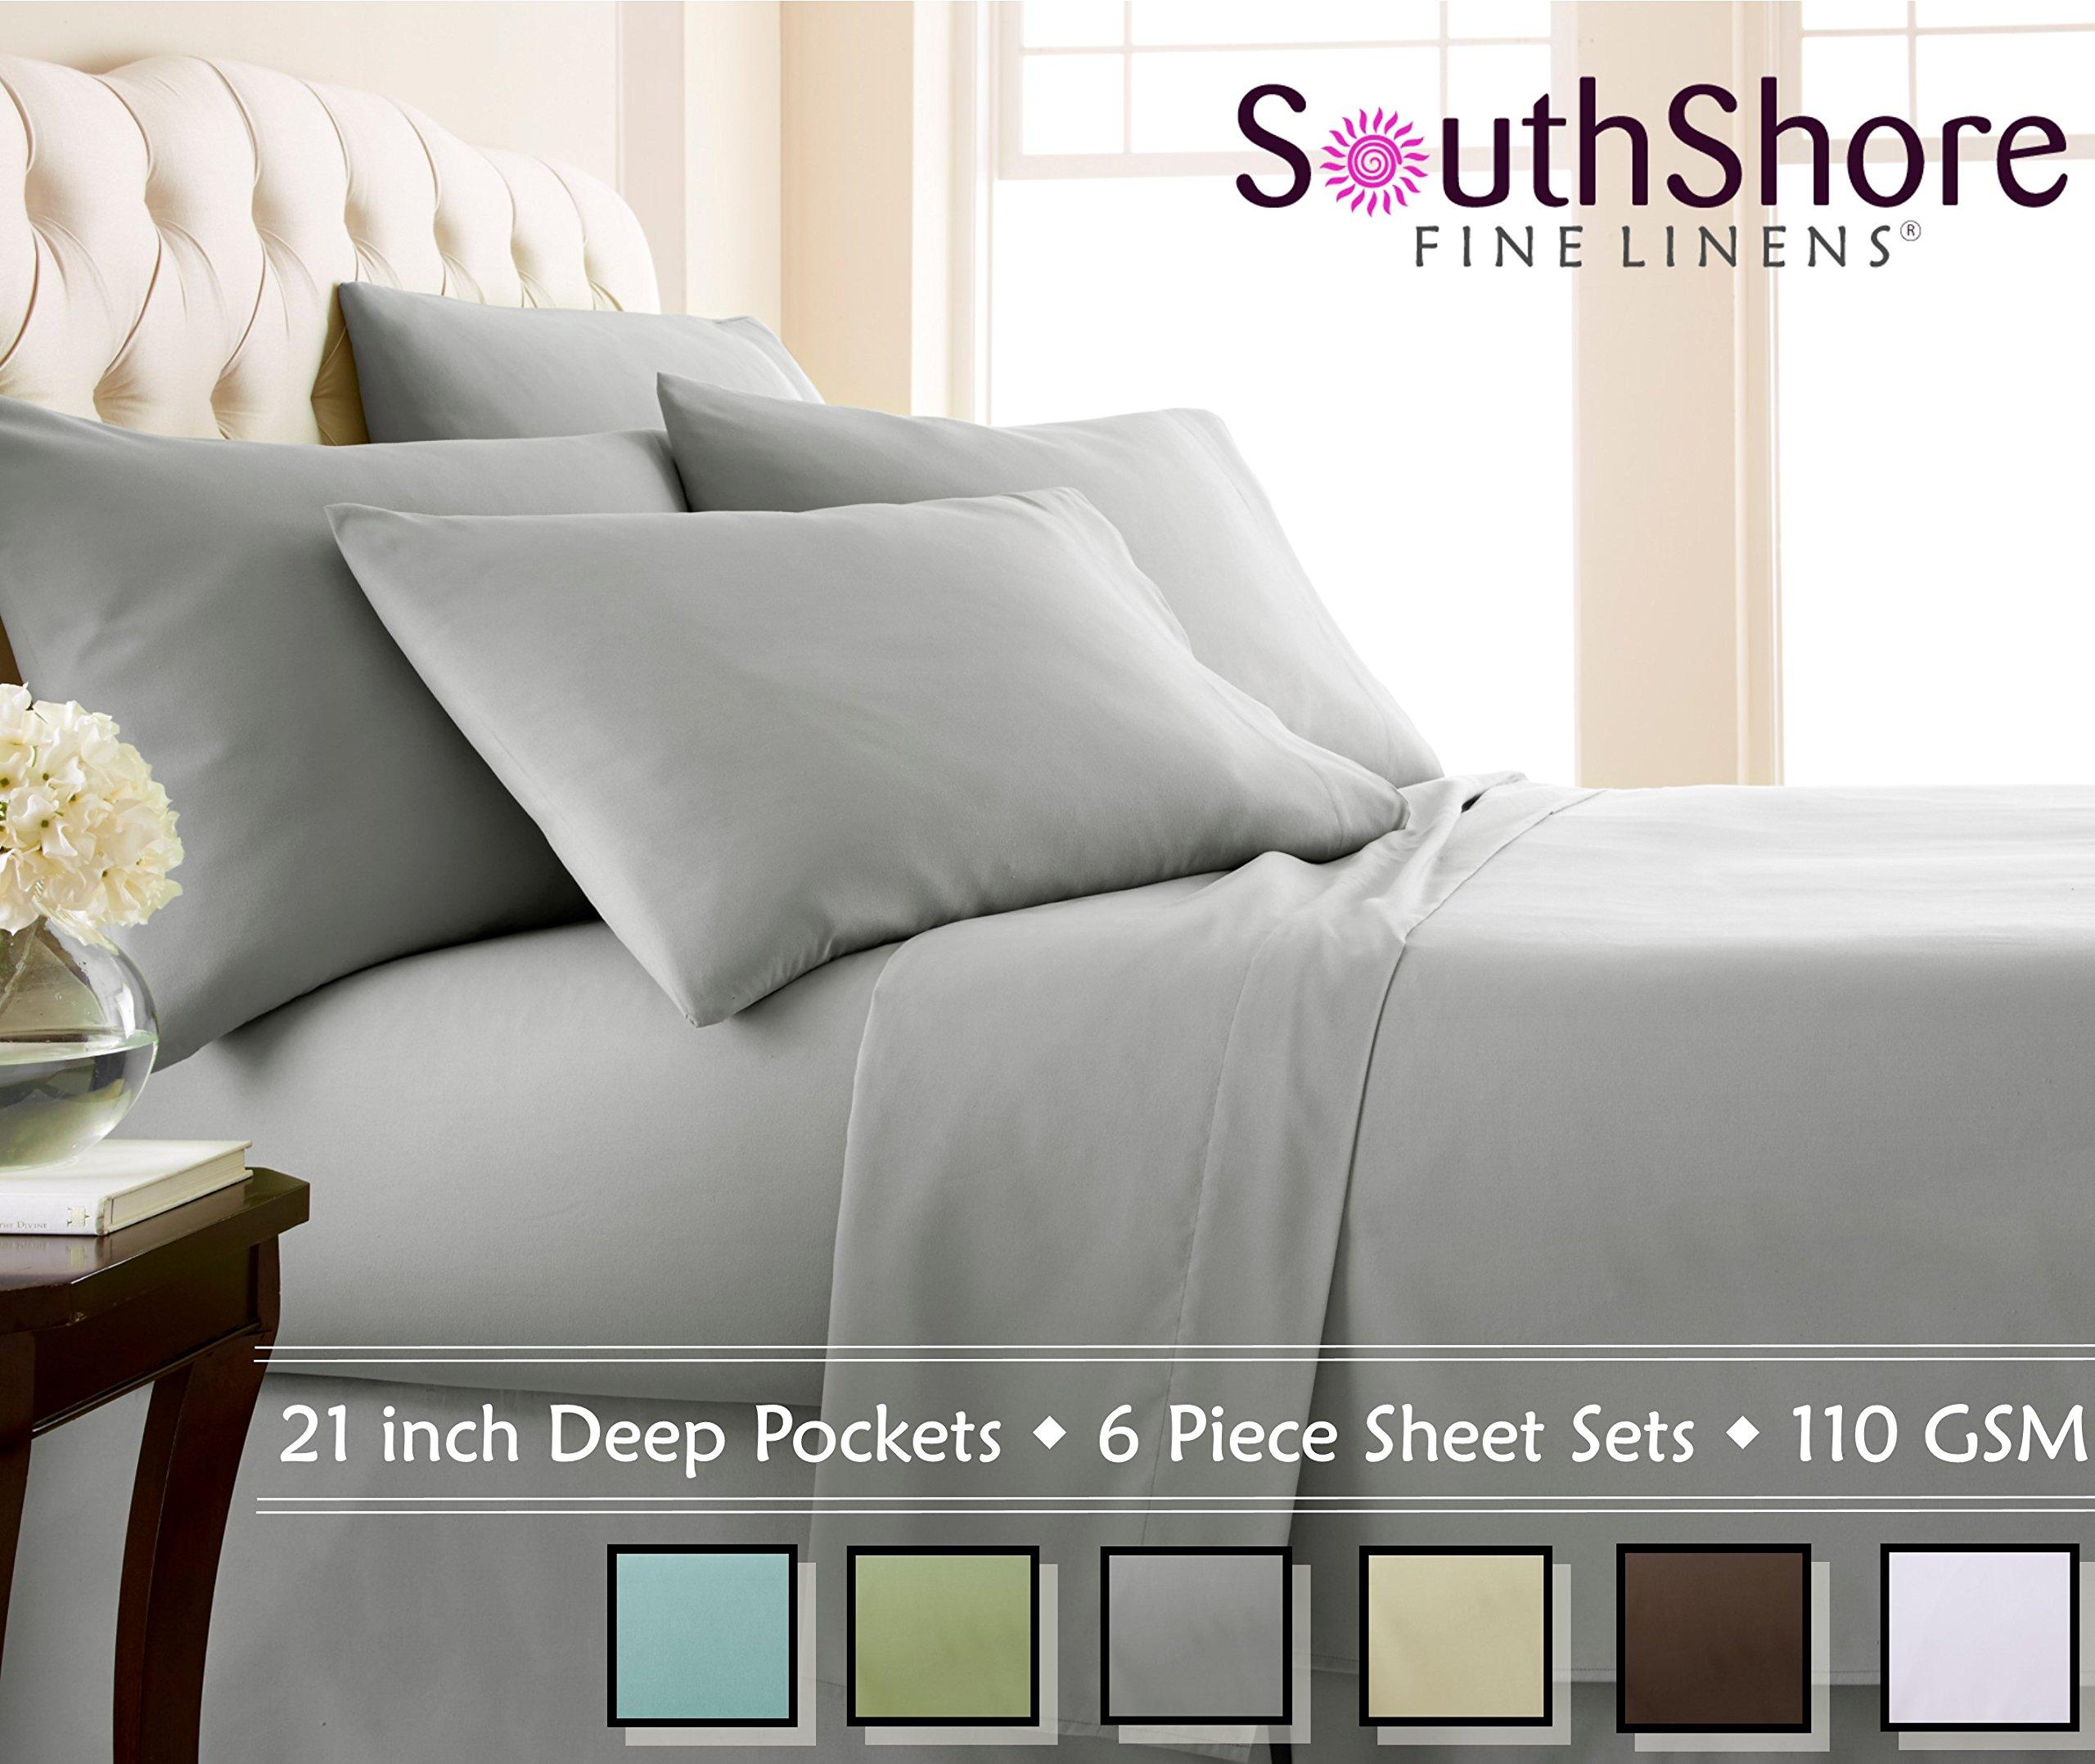 Southshore Fine Linens Extra Deep Pocket Sheet Set, Queen, 6 Piece, Steel Gray